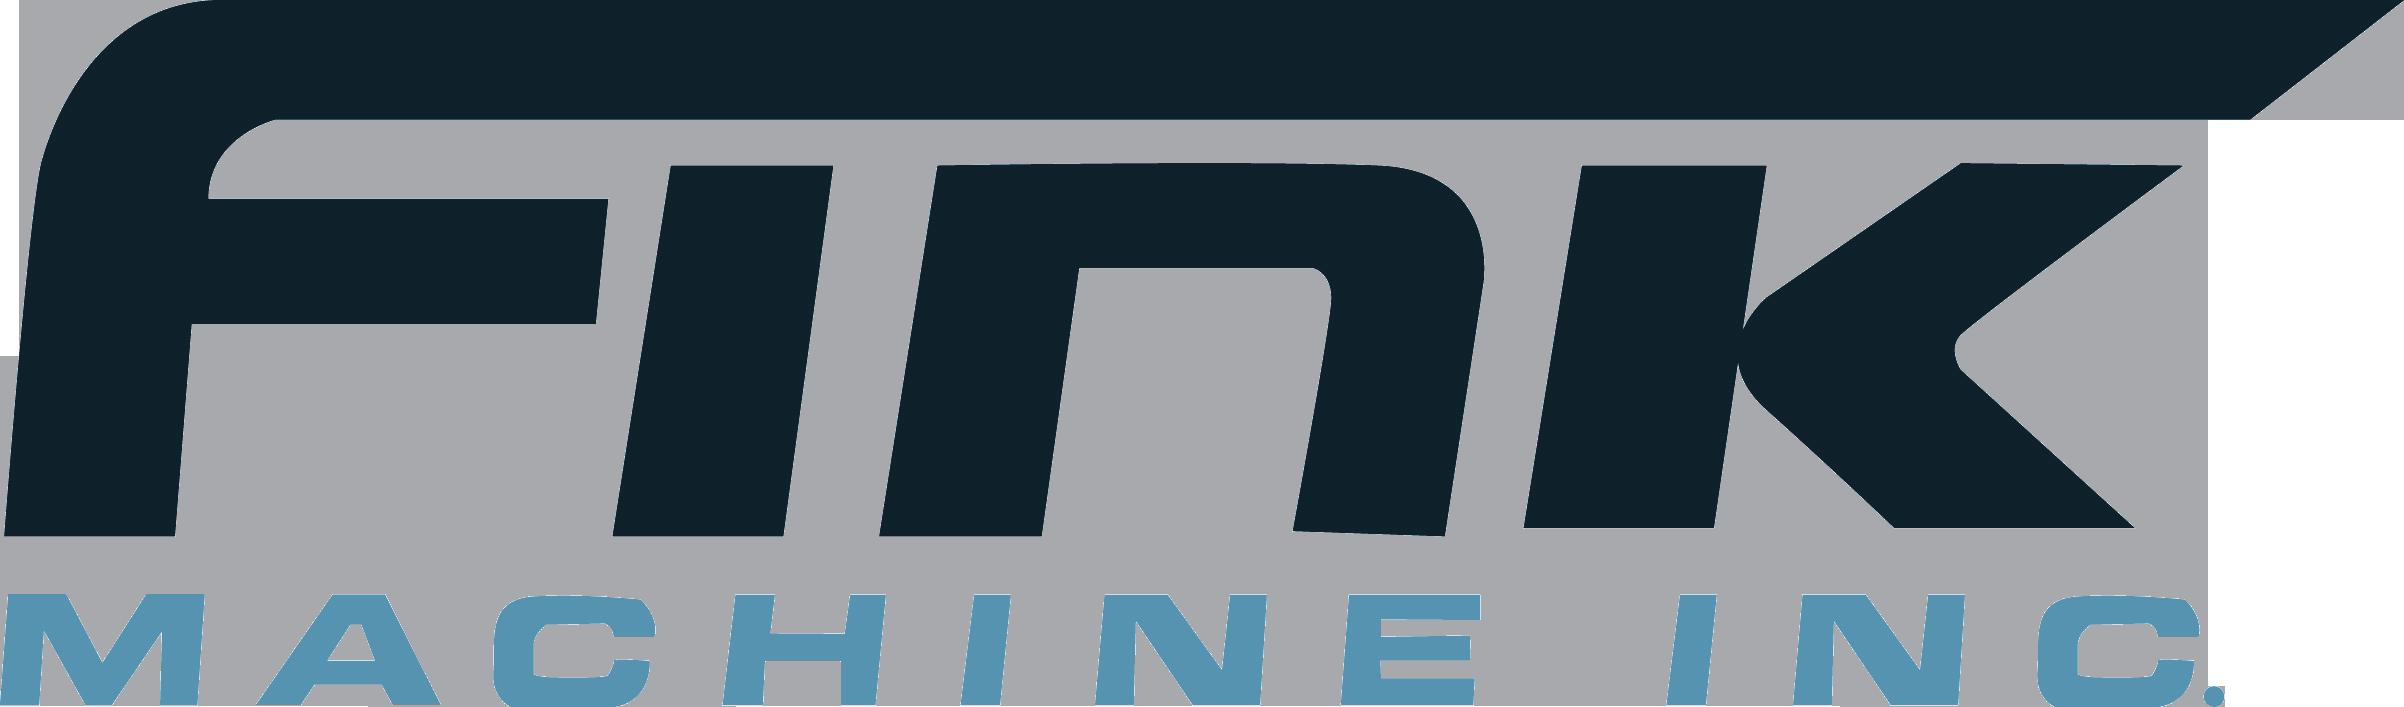 Fink Machine - Logo - web